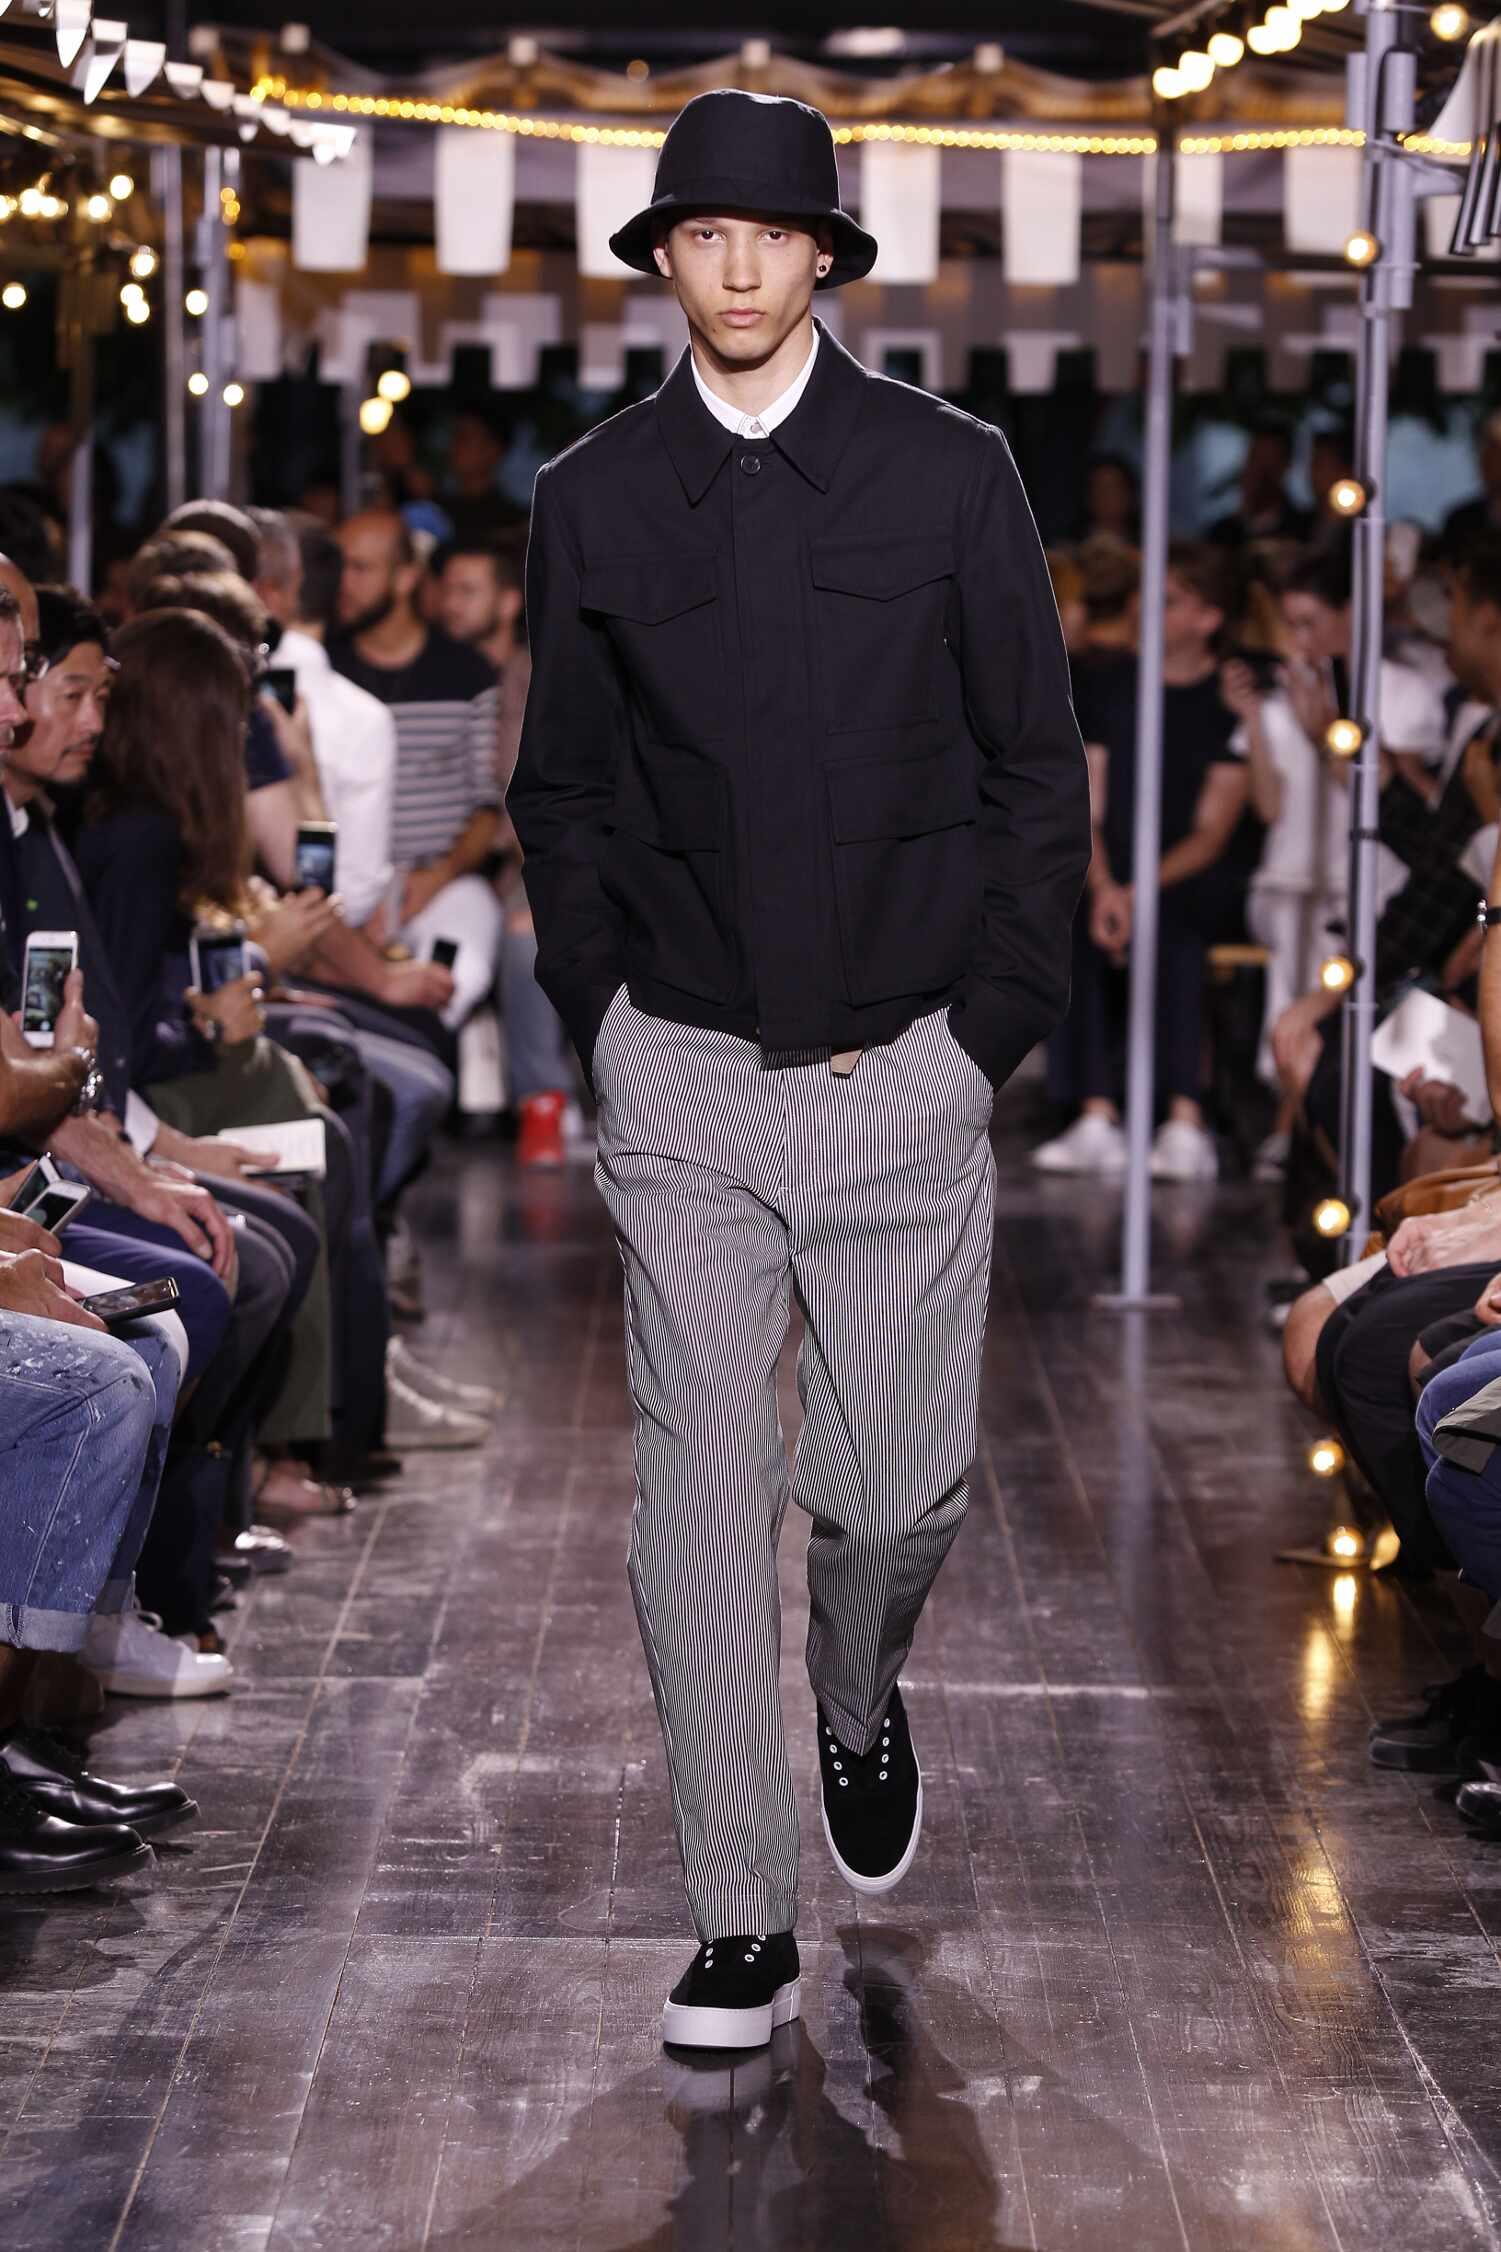 Spring Ami Collection Fashion Men Model